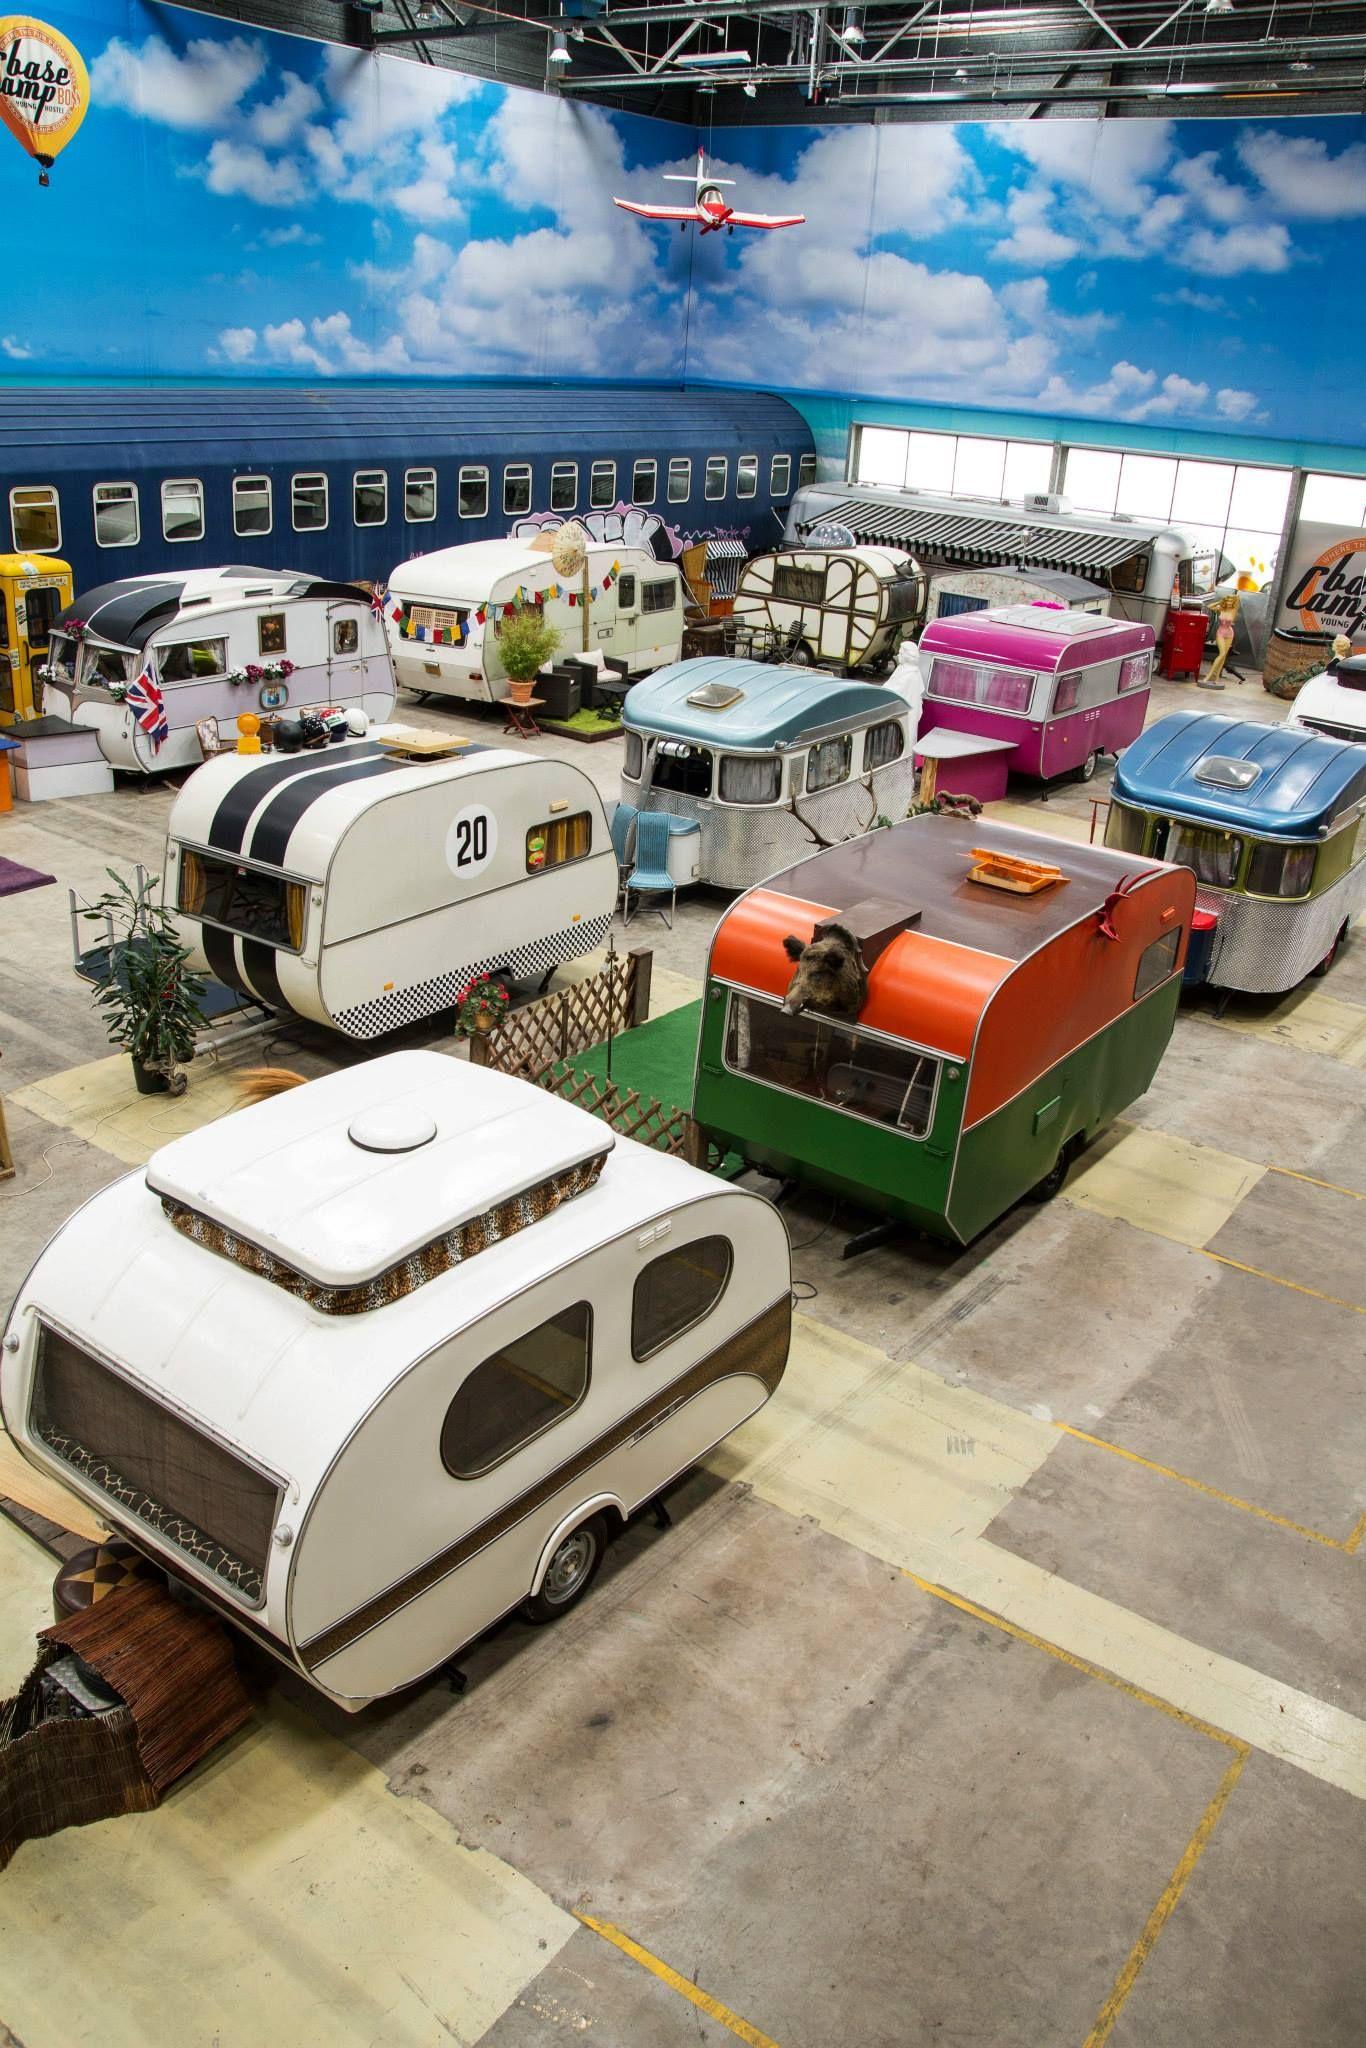 e1c3dee2d5 The Indoor caravan park inside a German former storage facility ...